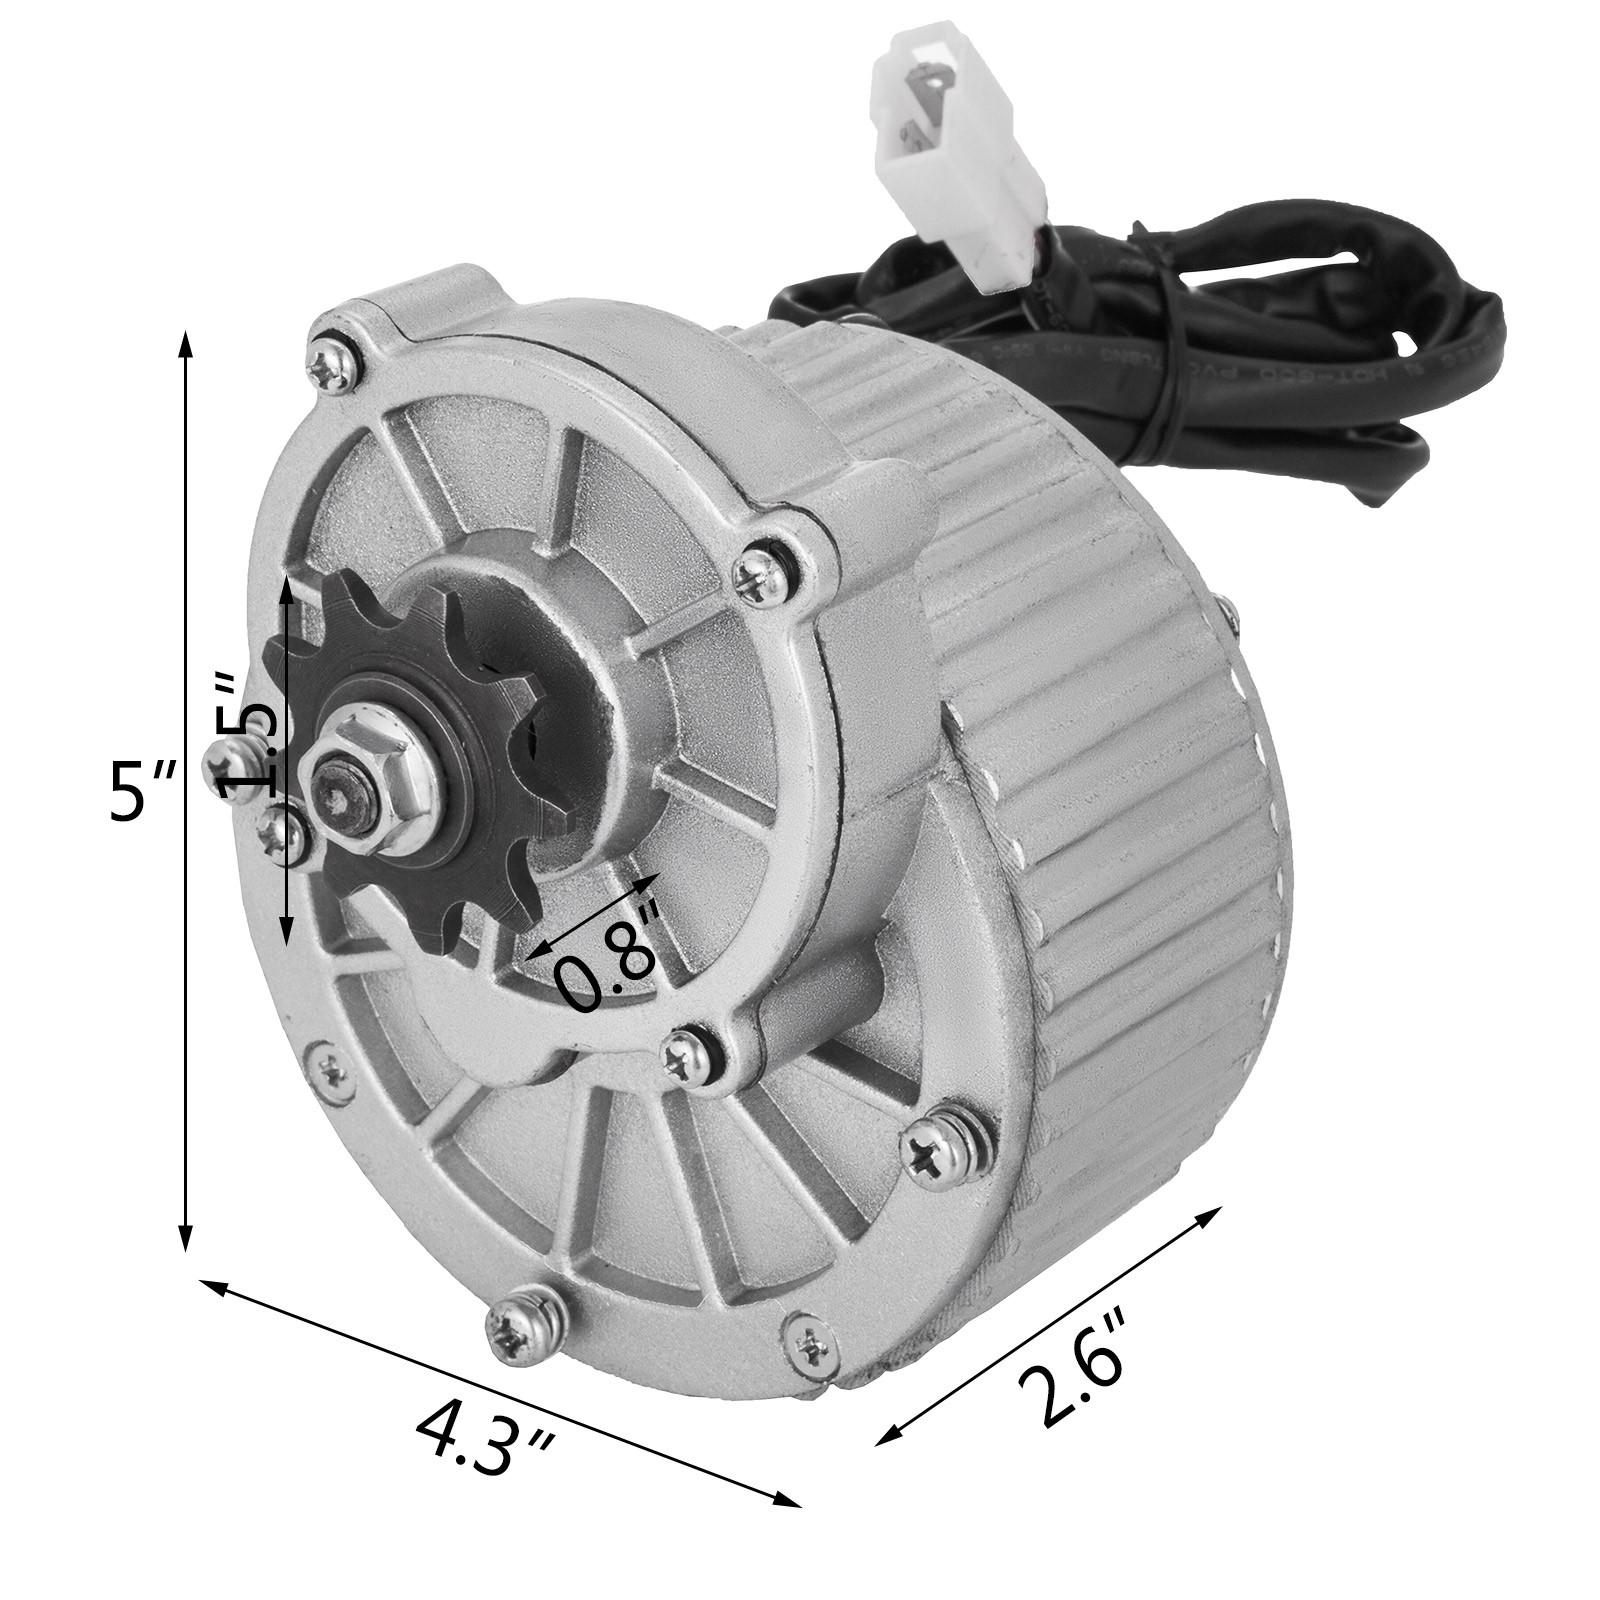 24V-500W-3500RPM-Electric-Motor-f-scooter-bike-go-kart-minibike-MY1016 thumbnail 62